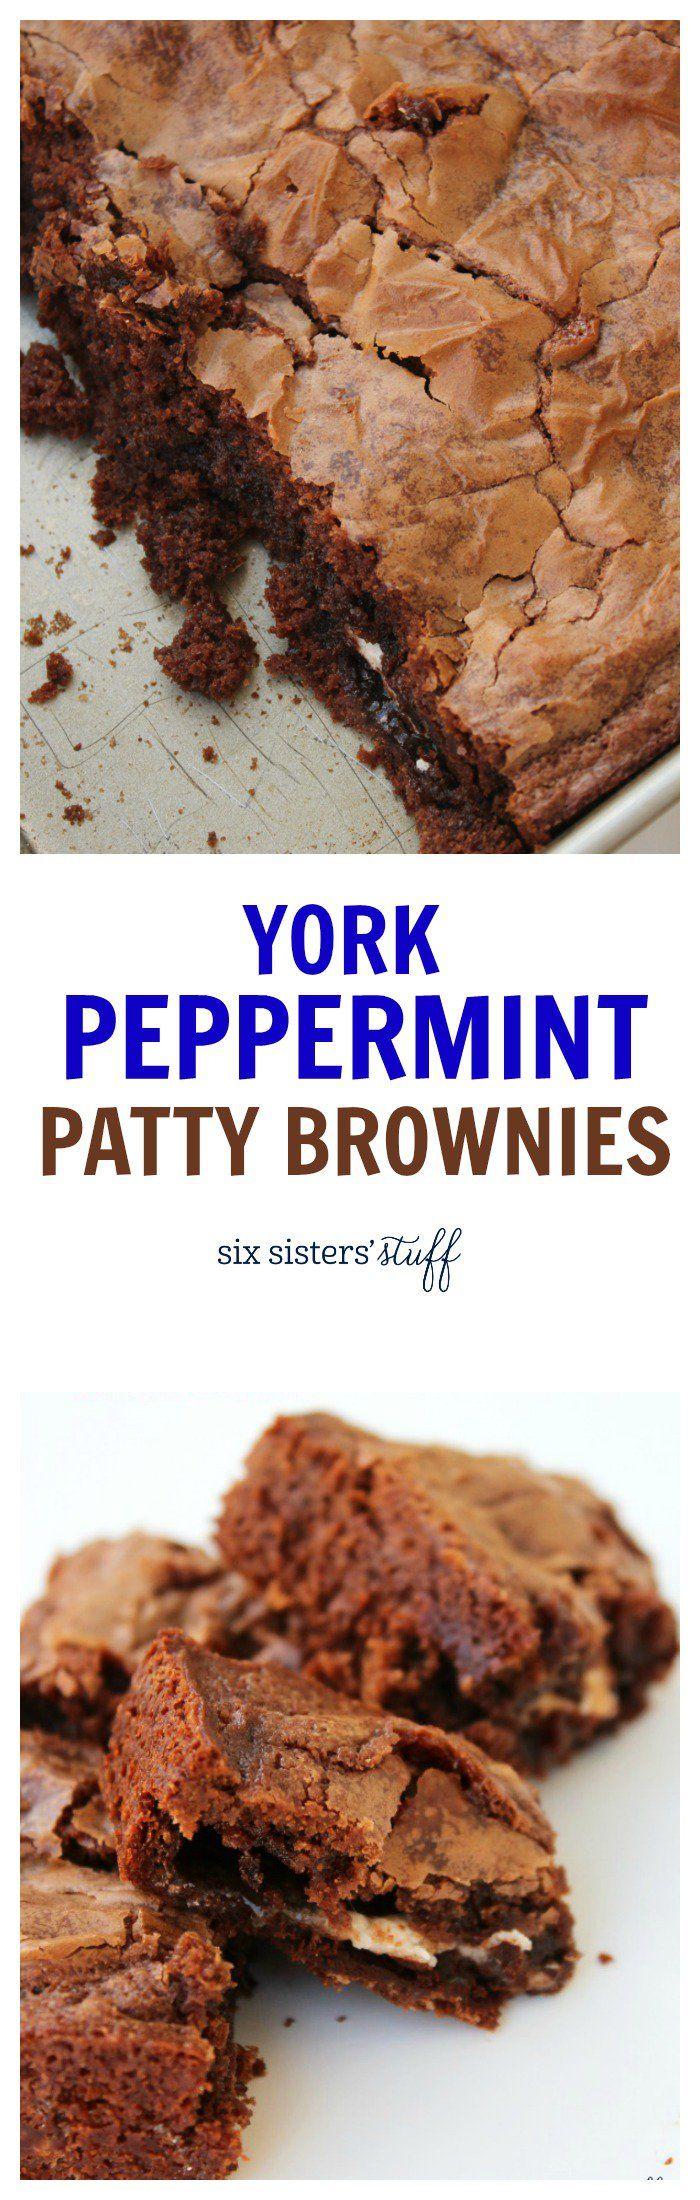 York Peppermint Patty Brownies Recipe/Six Sisters' Stuff | Six Sisters' Stuff